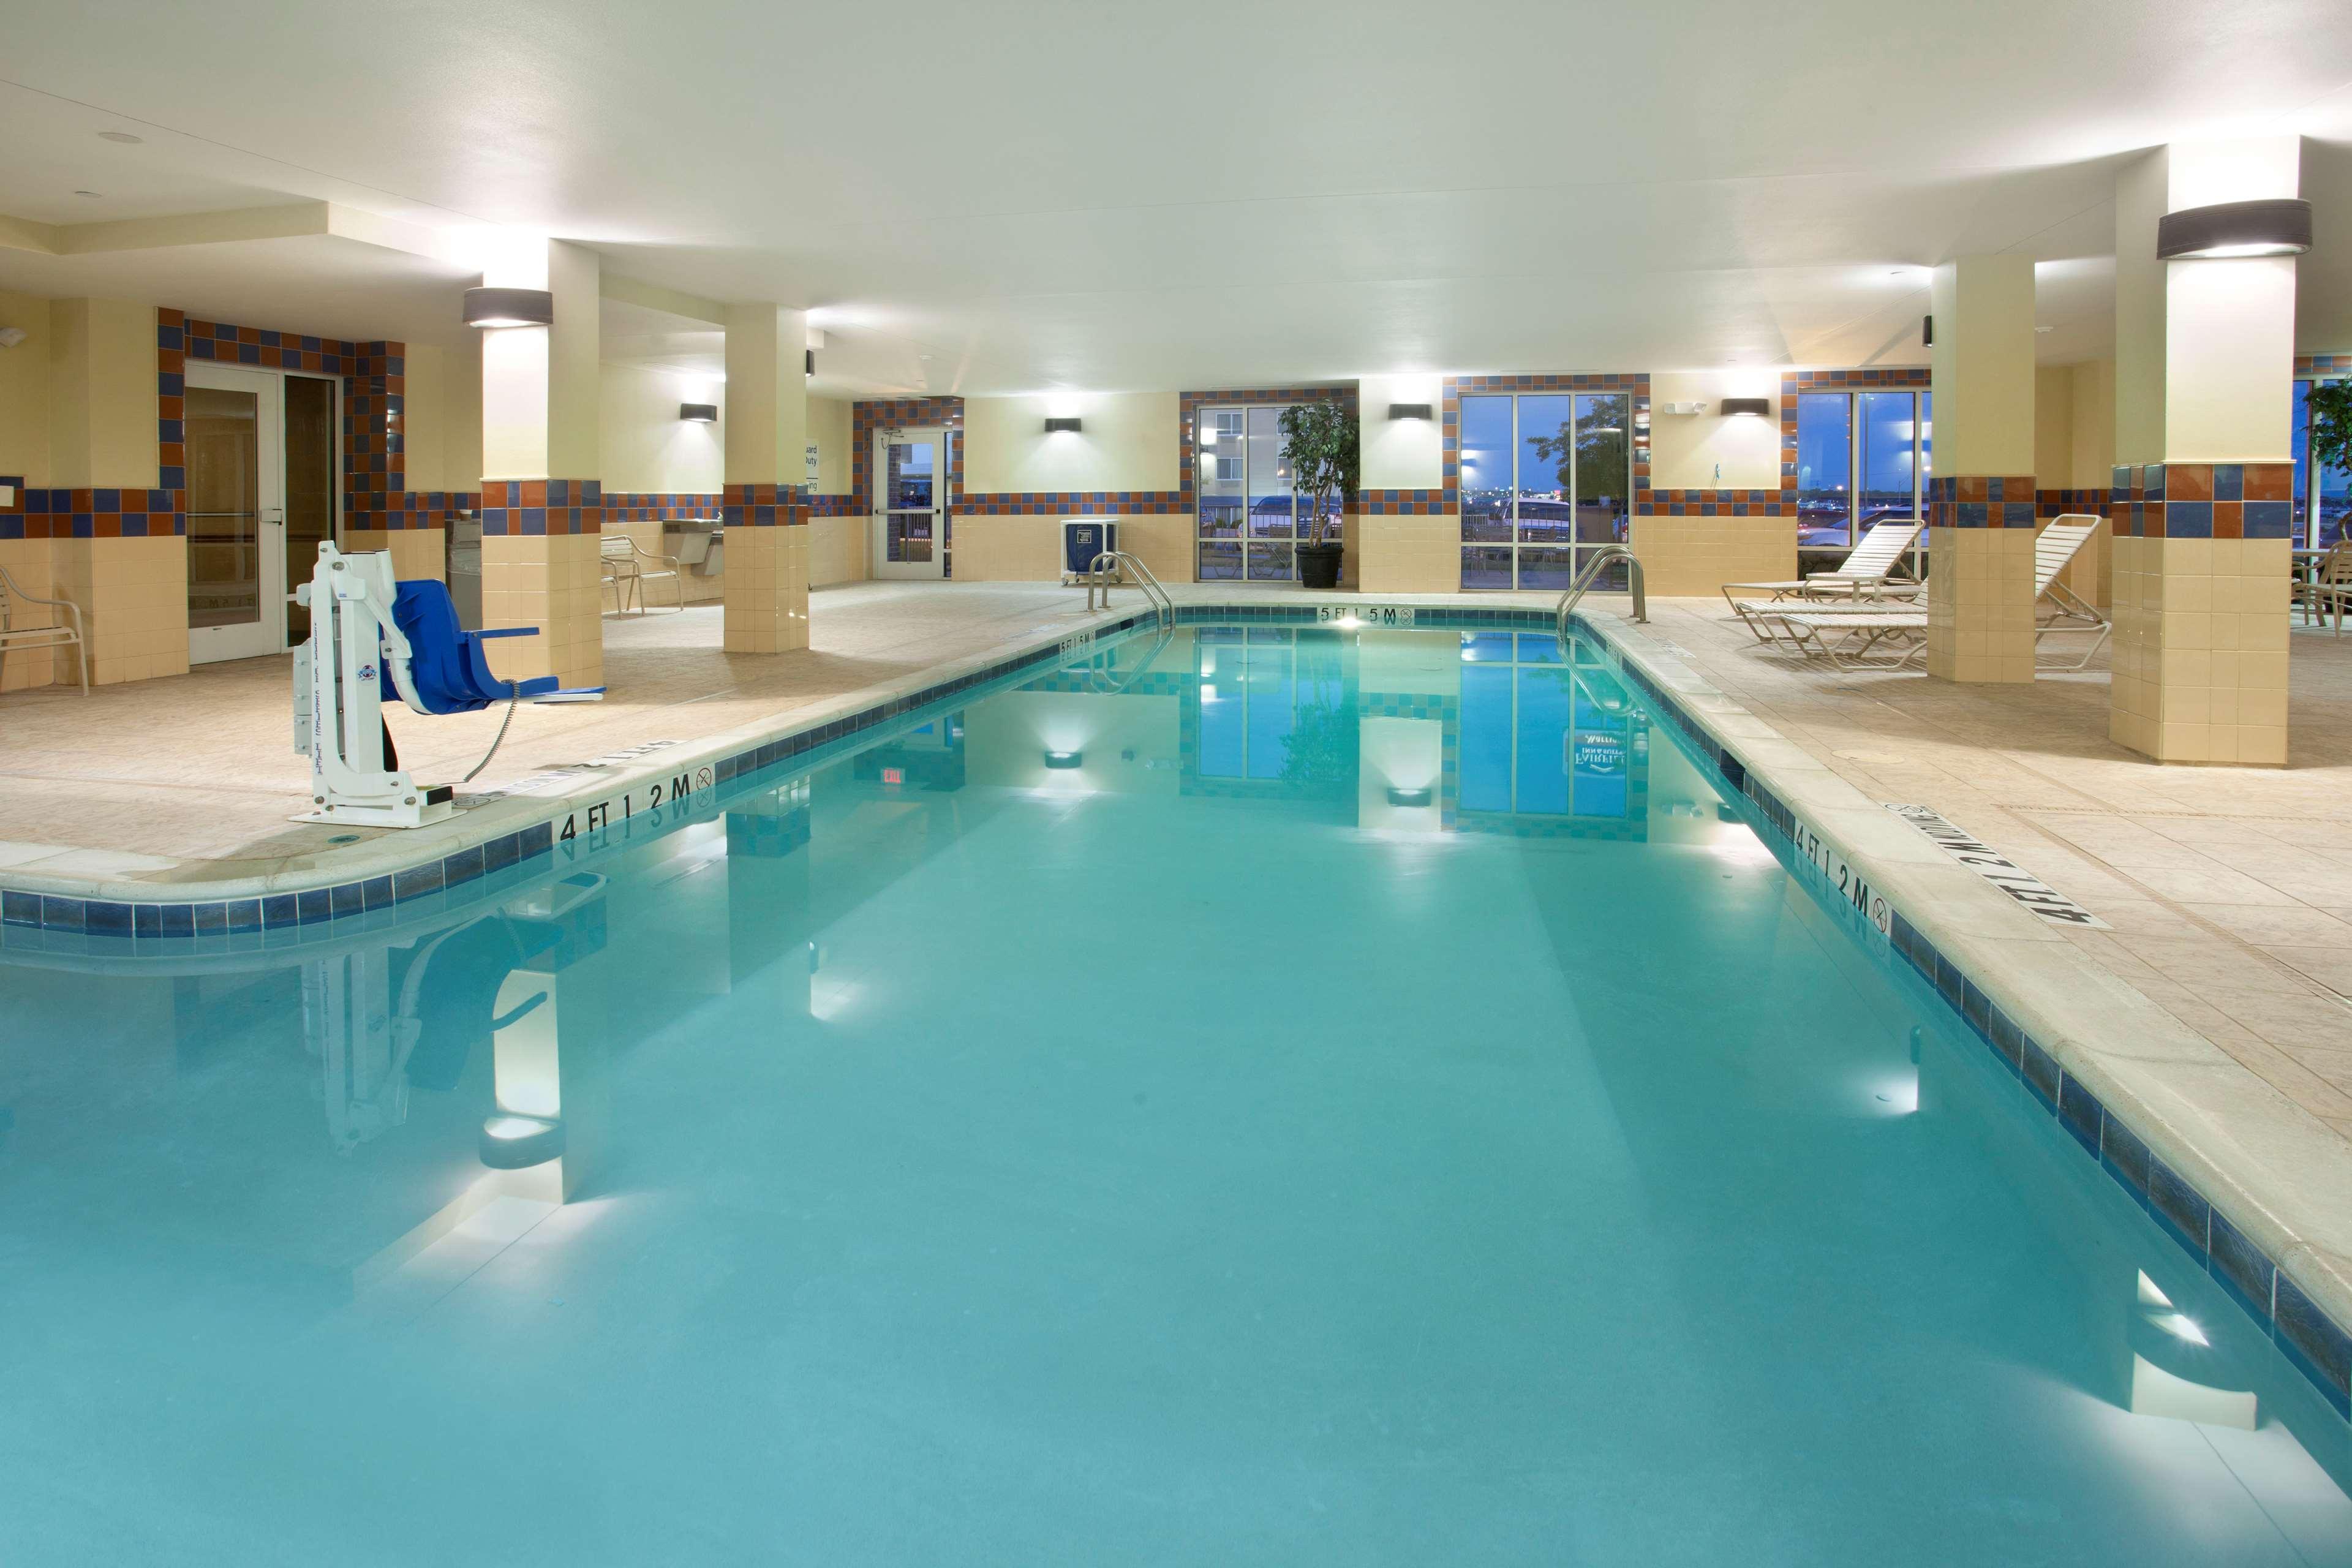 Hampton Inn & Suites Fort Worth-West-I-30 image 4